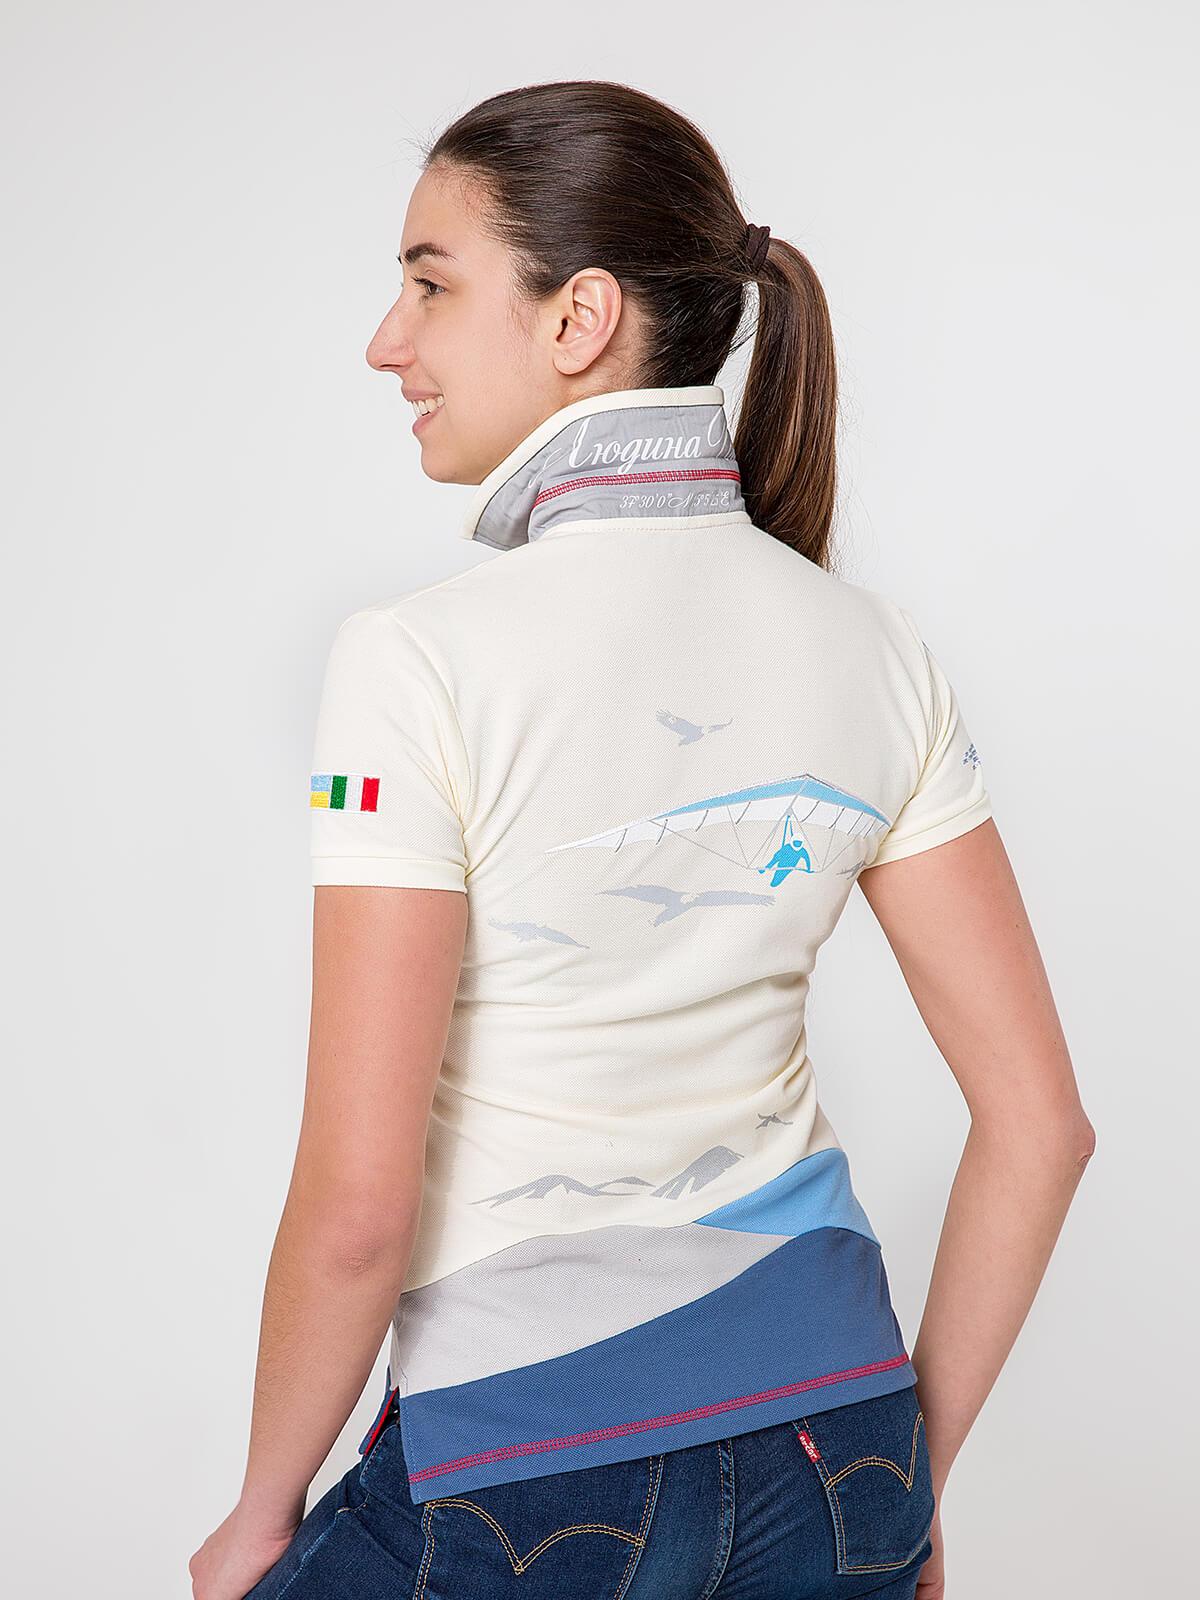 Women's Polo Shirt D'arrigo. Color ivory.  Technique of prints applied: embroidery, silkscreen printing.